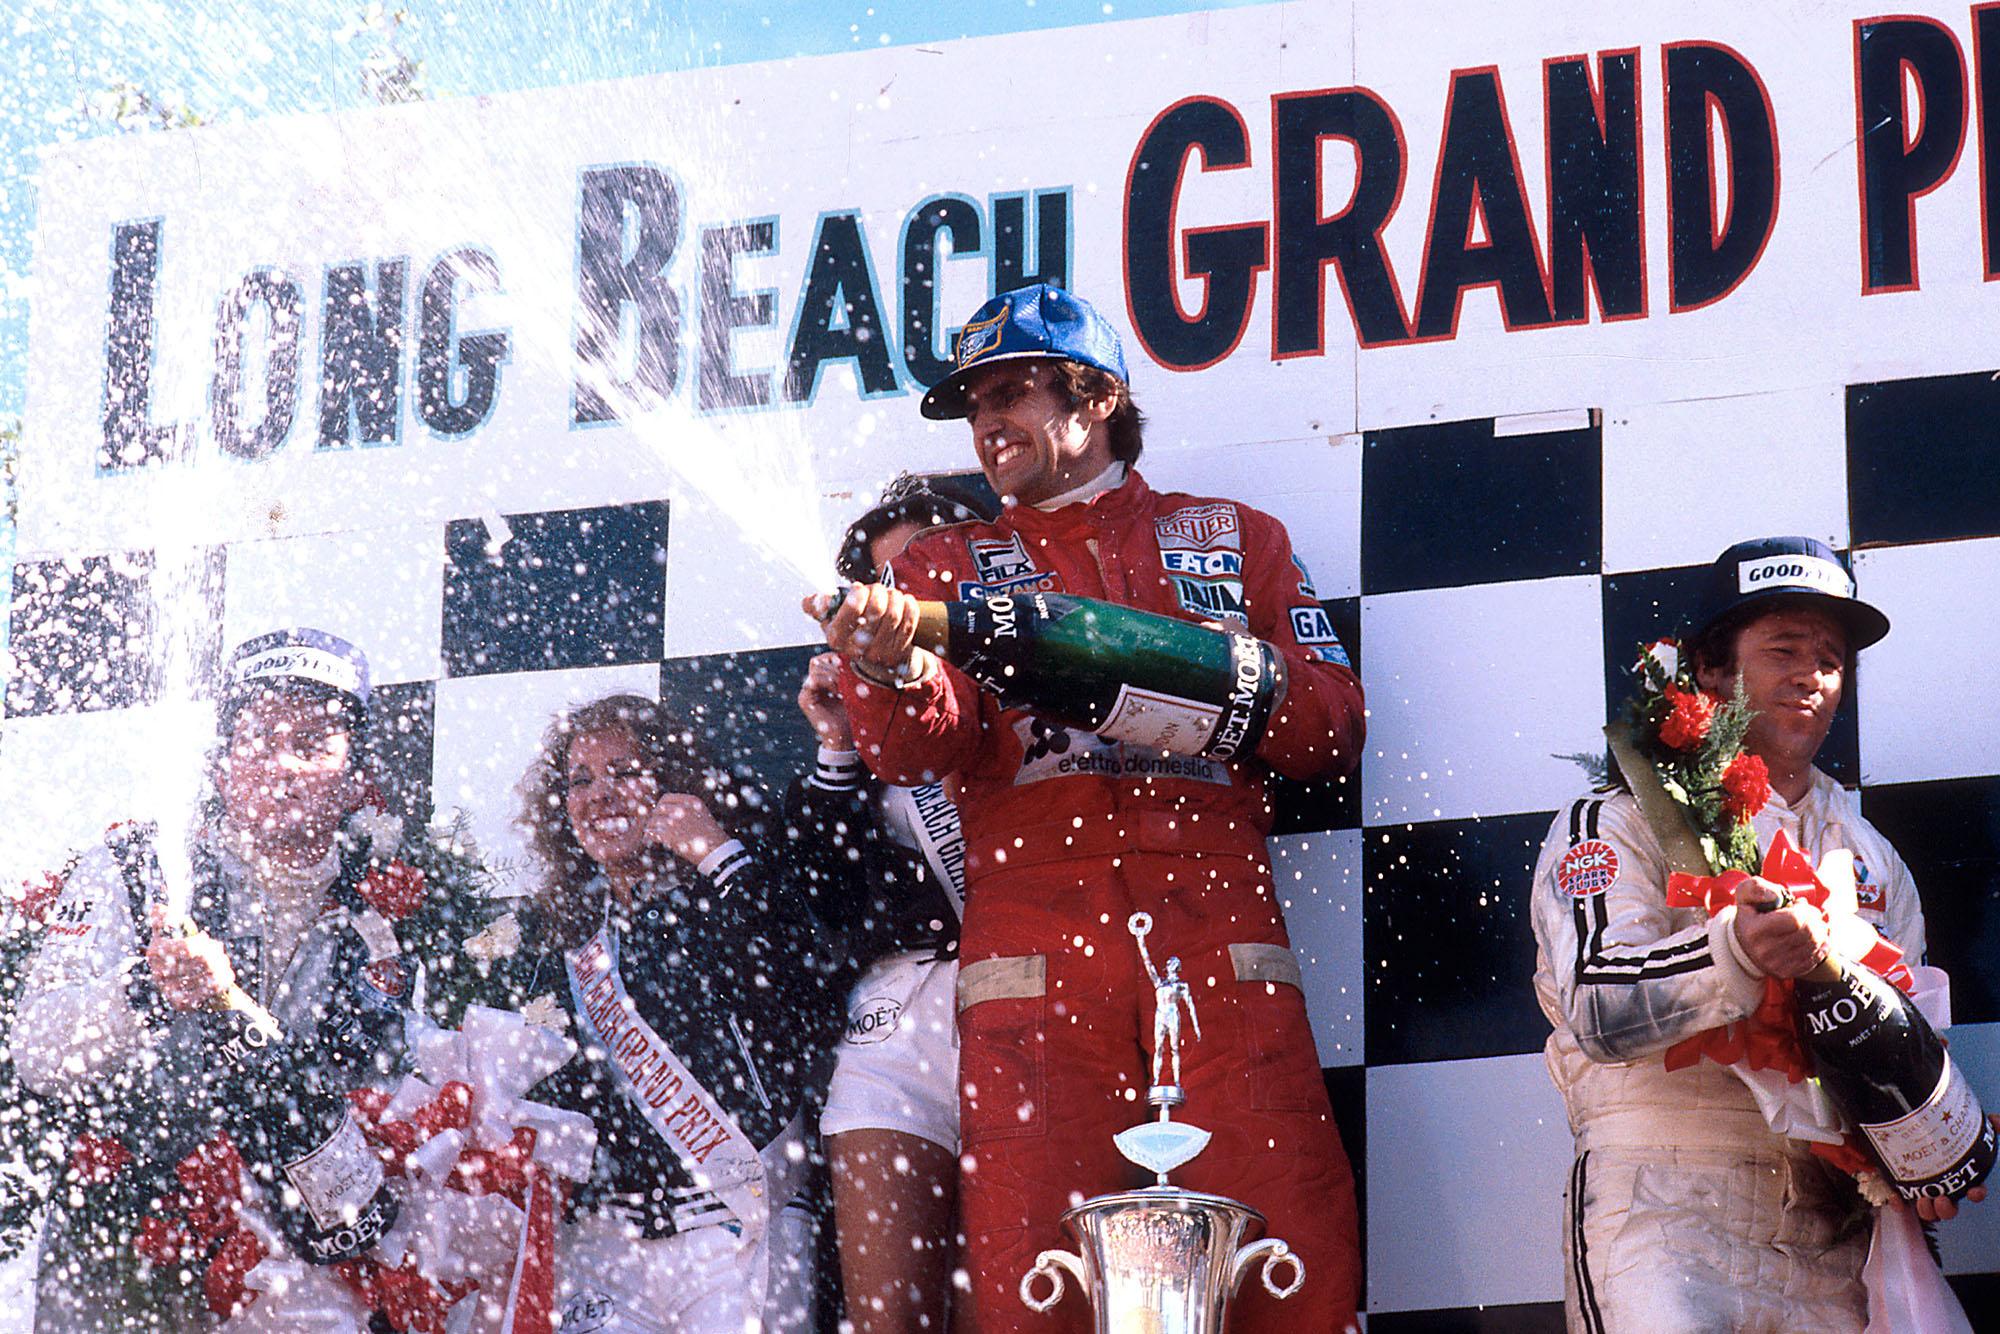 Carlos Reutemann (Ferrari) sprays champagne on the podium at the 1978 United States Grand Prix West, Long Beach.